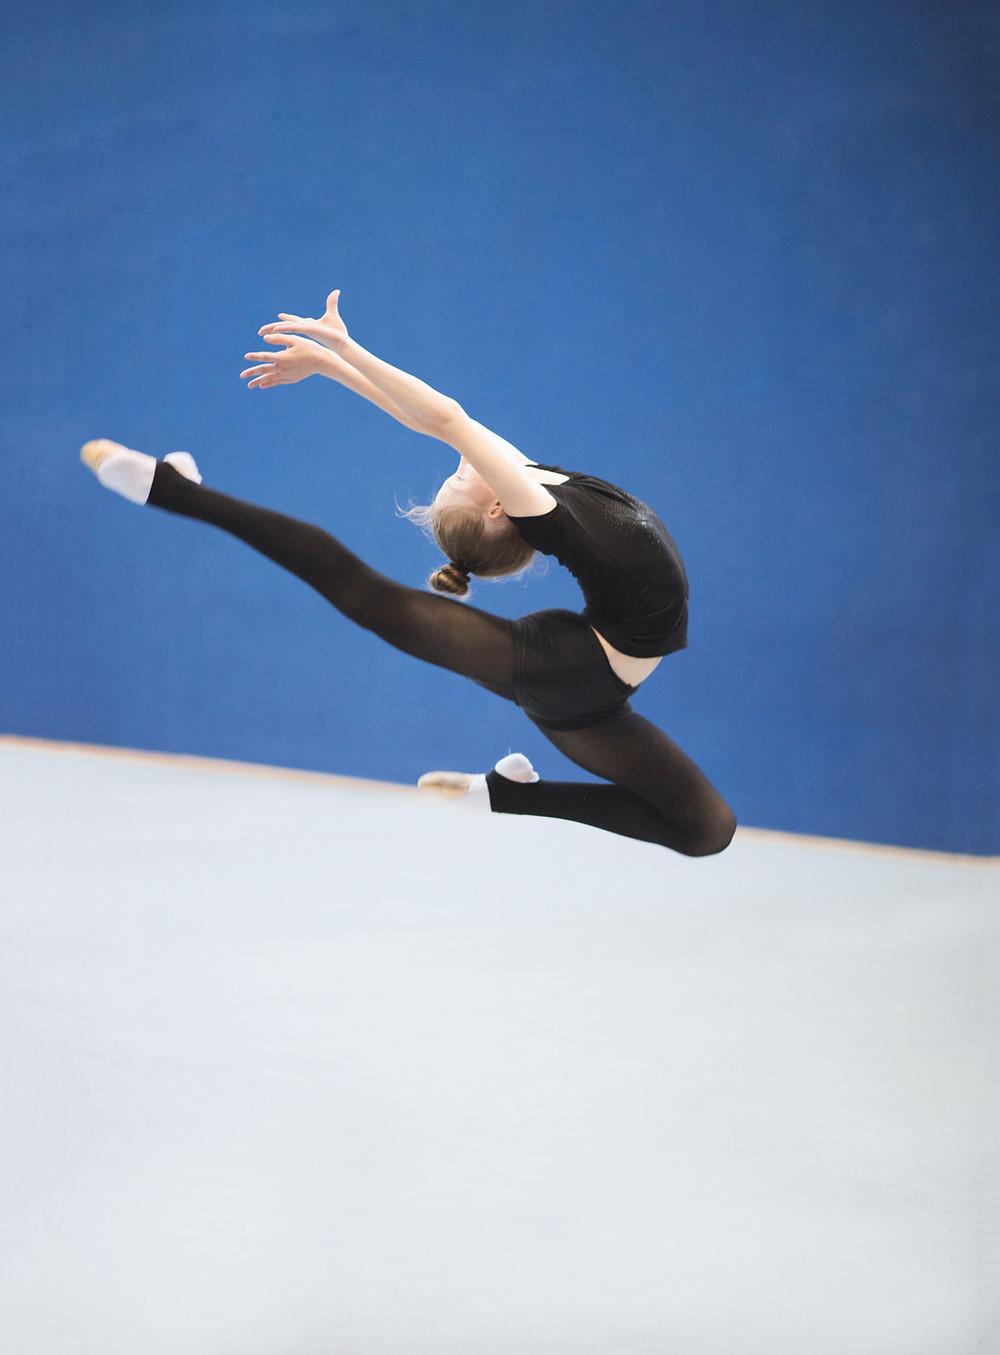 gymnaste en plein saut